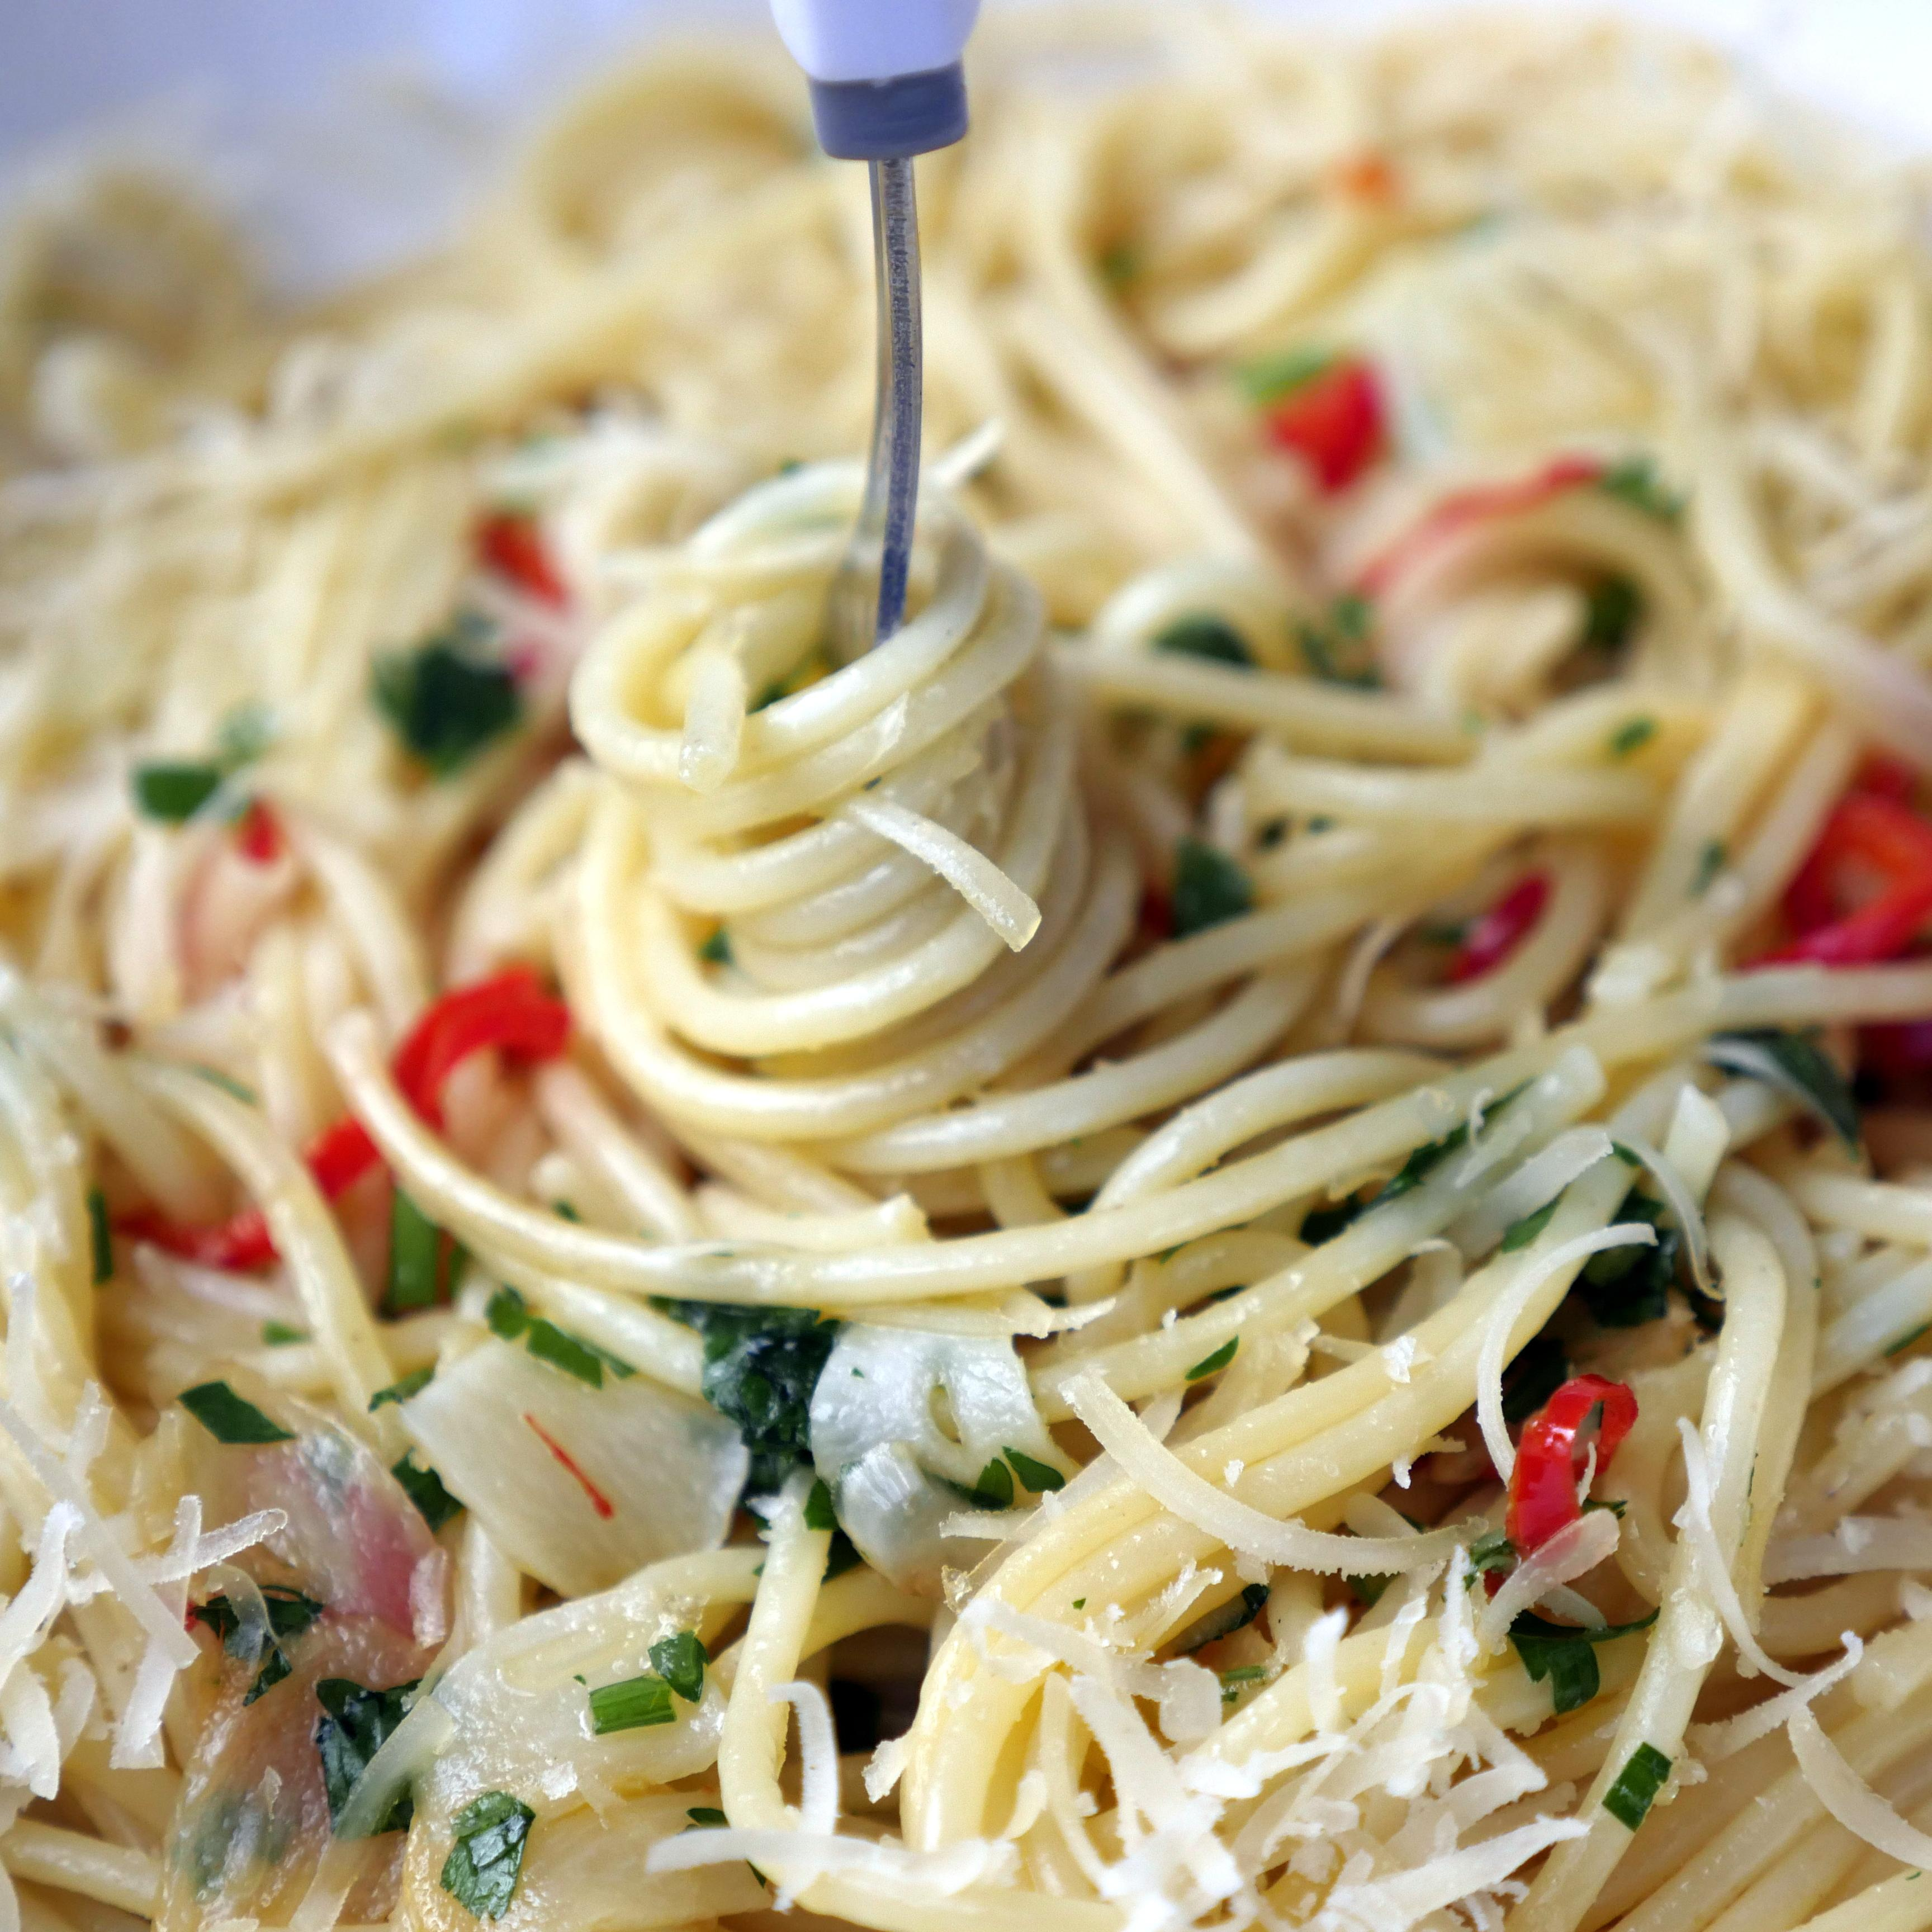 Viva Italia – spaghetti aglio olio e peperoncino